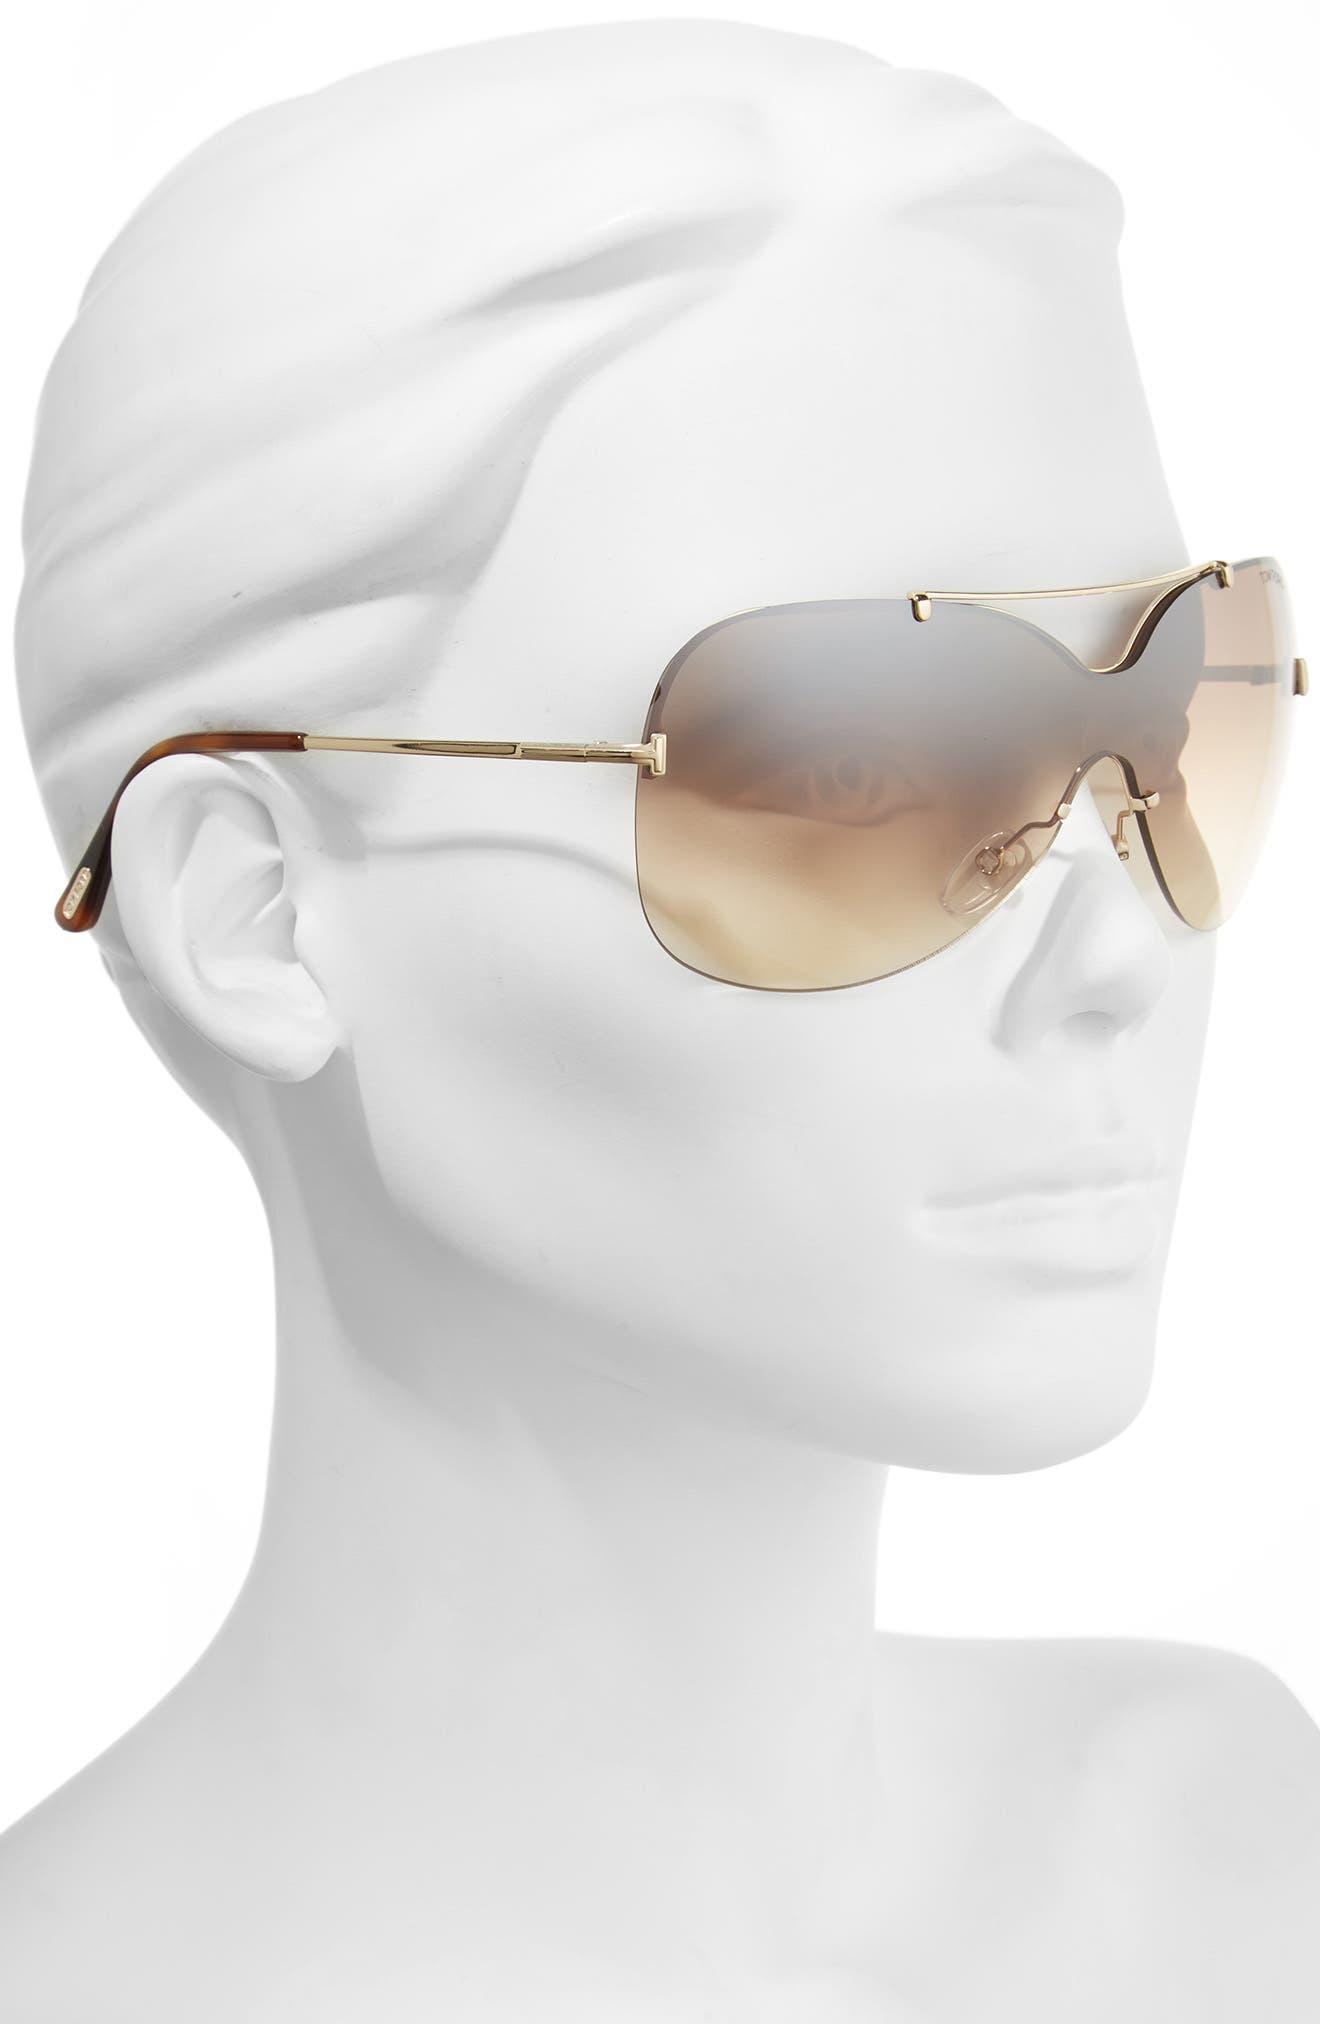 Ondria Gradient Lens Shield Sunglasses,                             Alternate thumbnail 5, color,